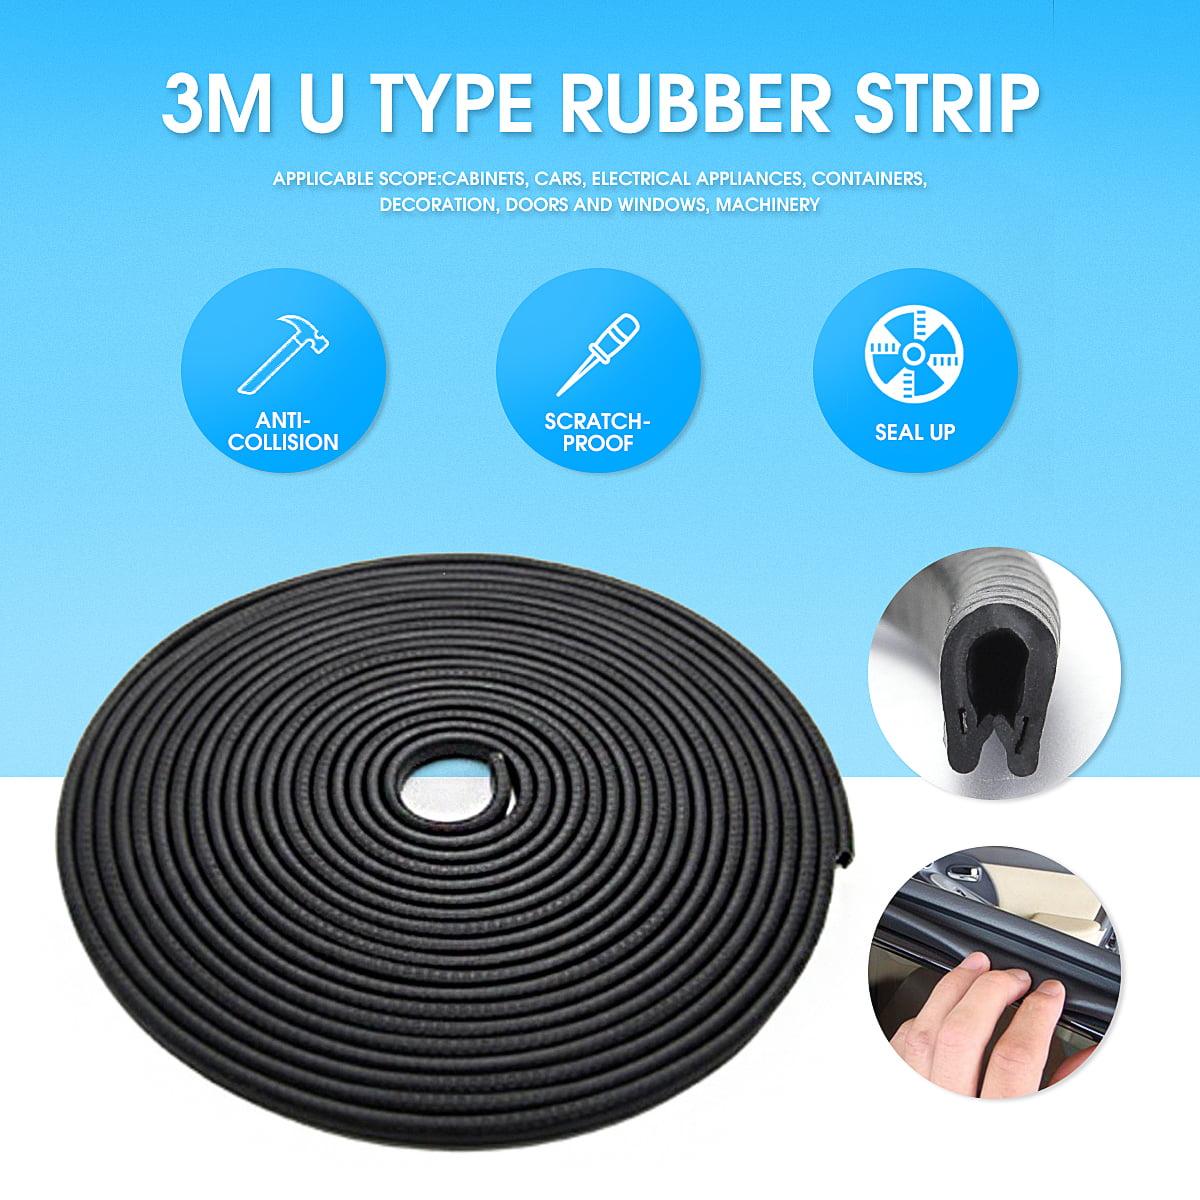 3M Edge Protector Rubber Seal Moulding Strip U Shape Channel Auto Car Door Guard Mold Trim Black 10mmx6mm